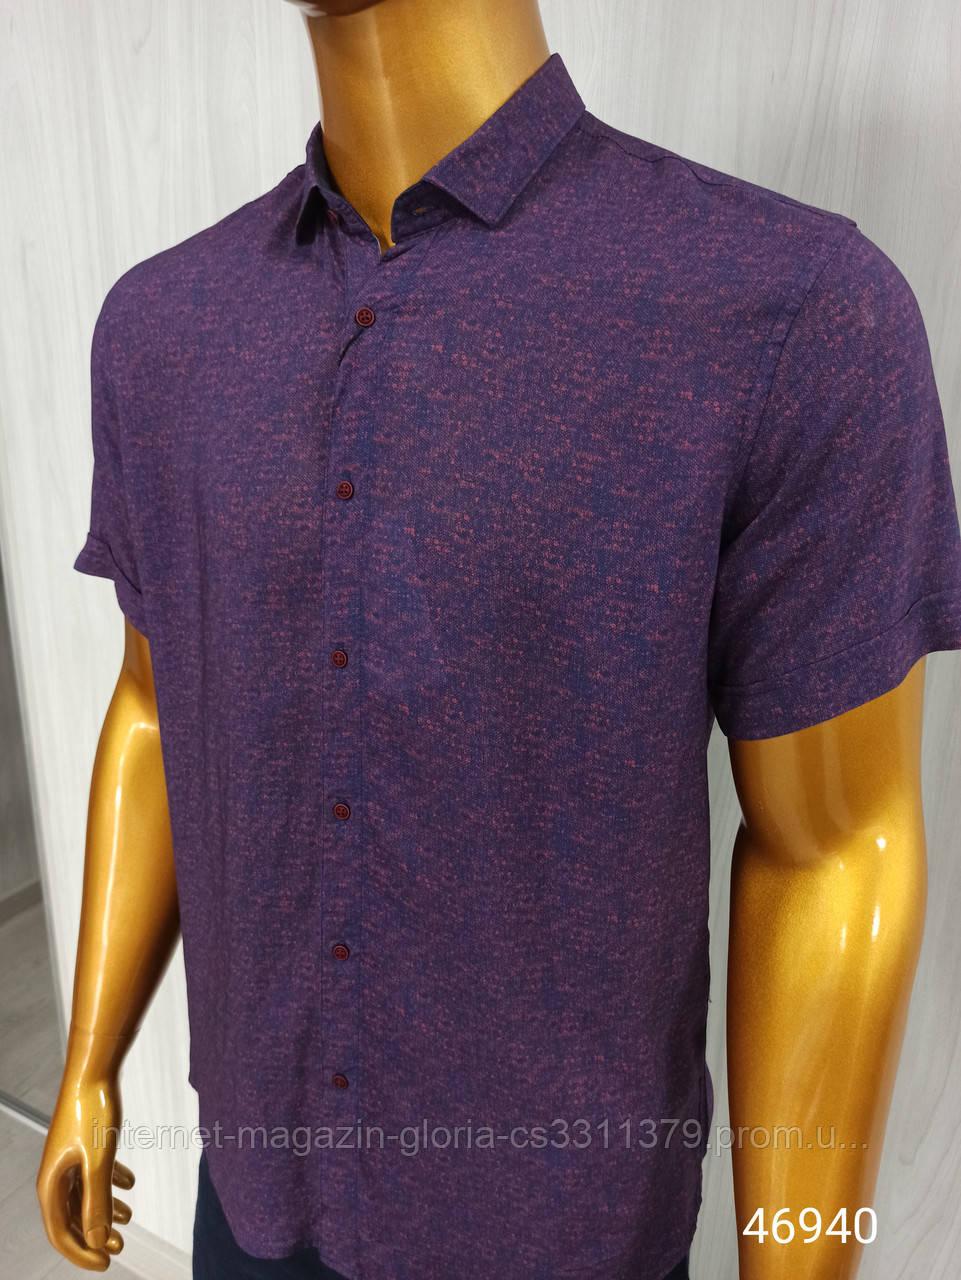 Мужская рубашка FLP. mod.46940. Размеры: M,L,XL,2XL.